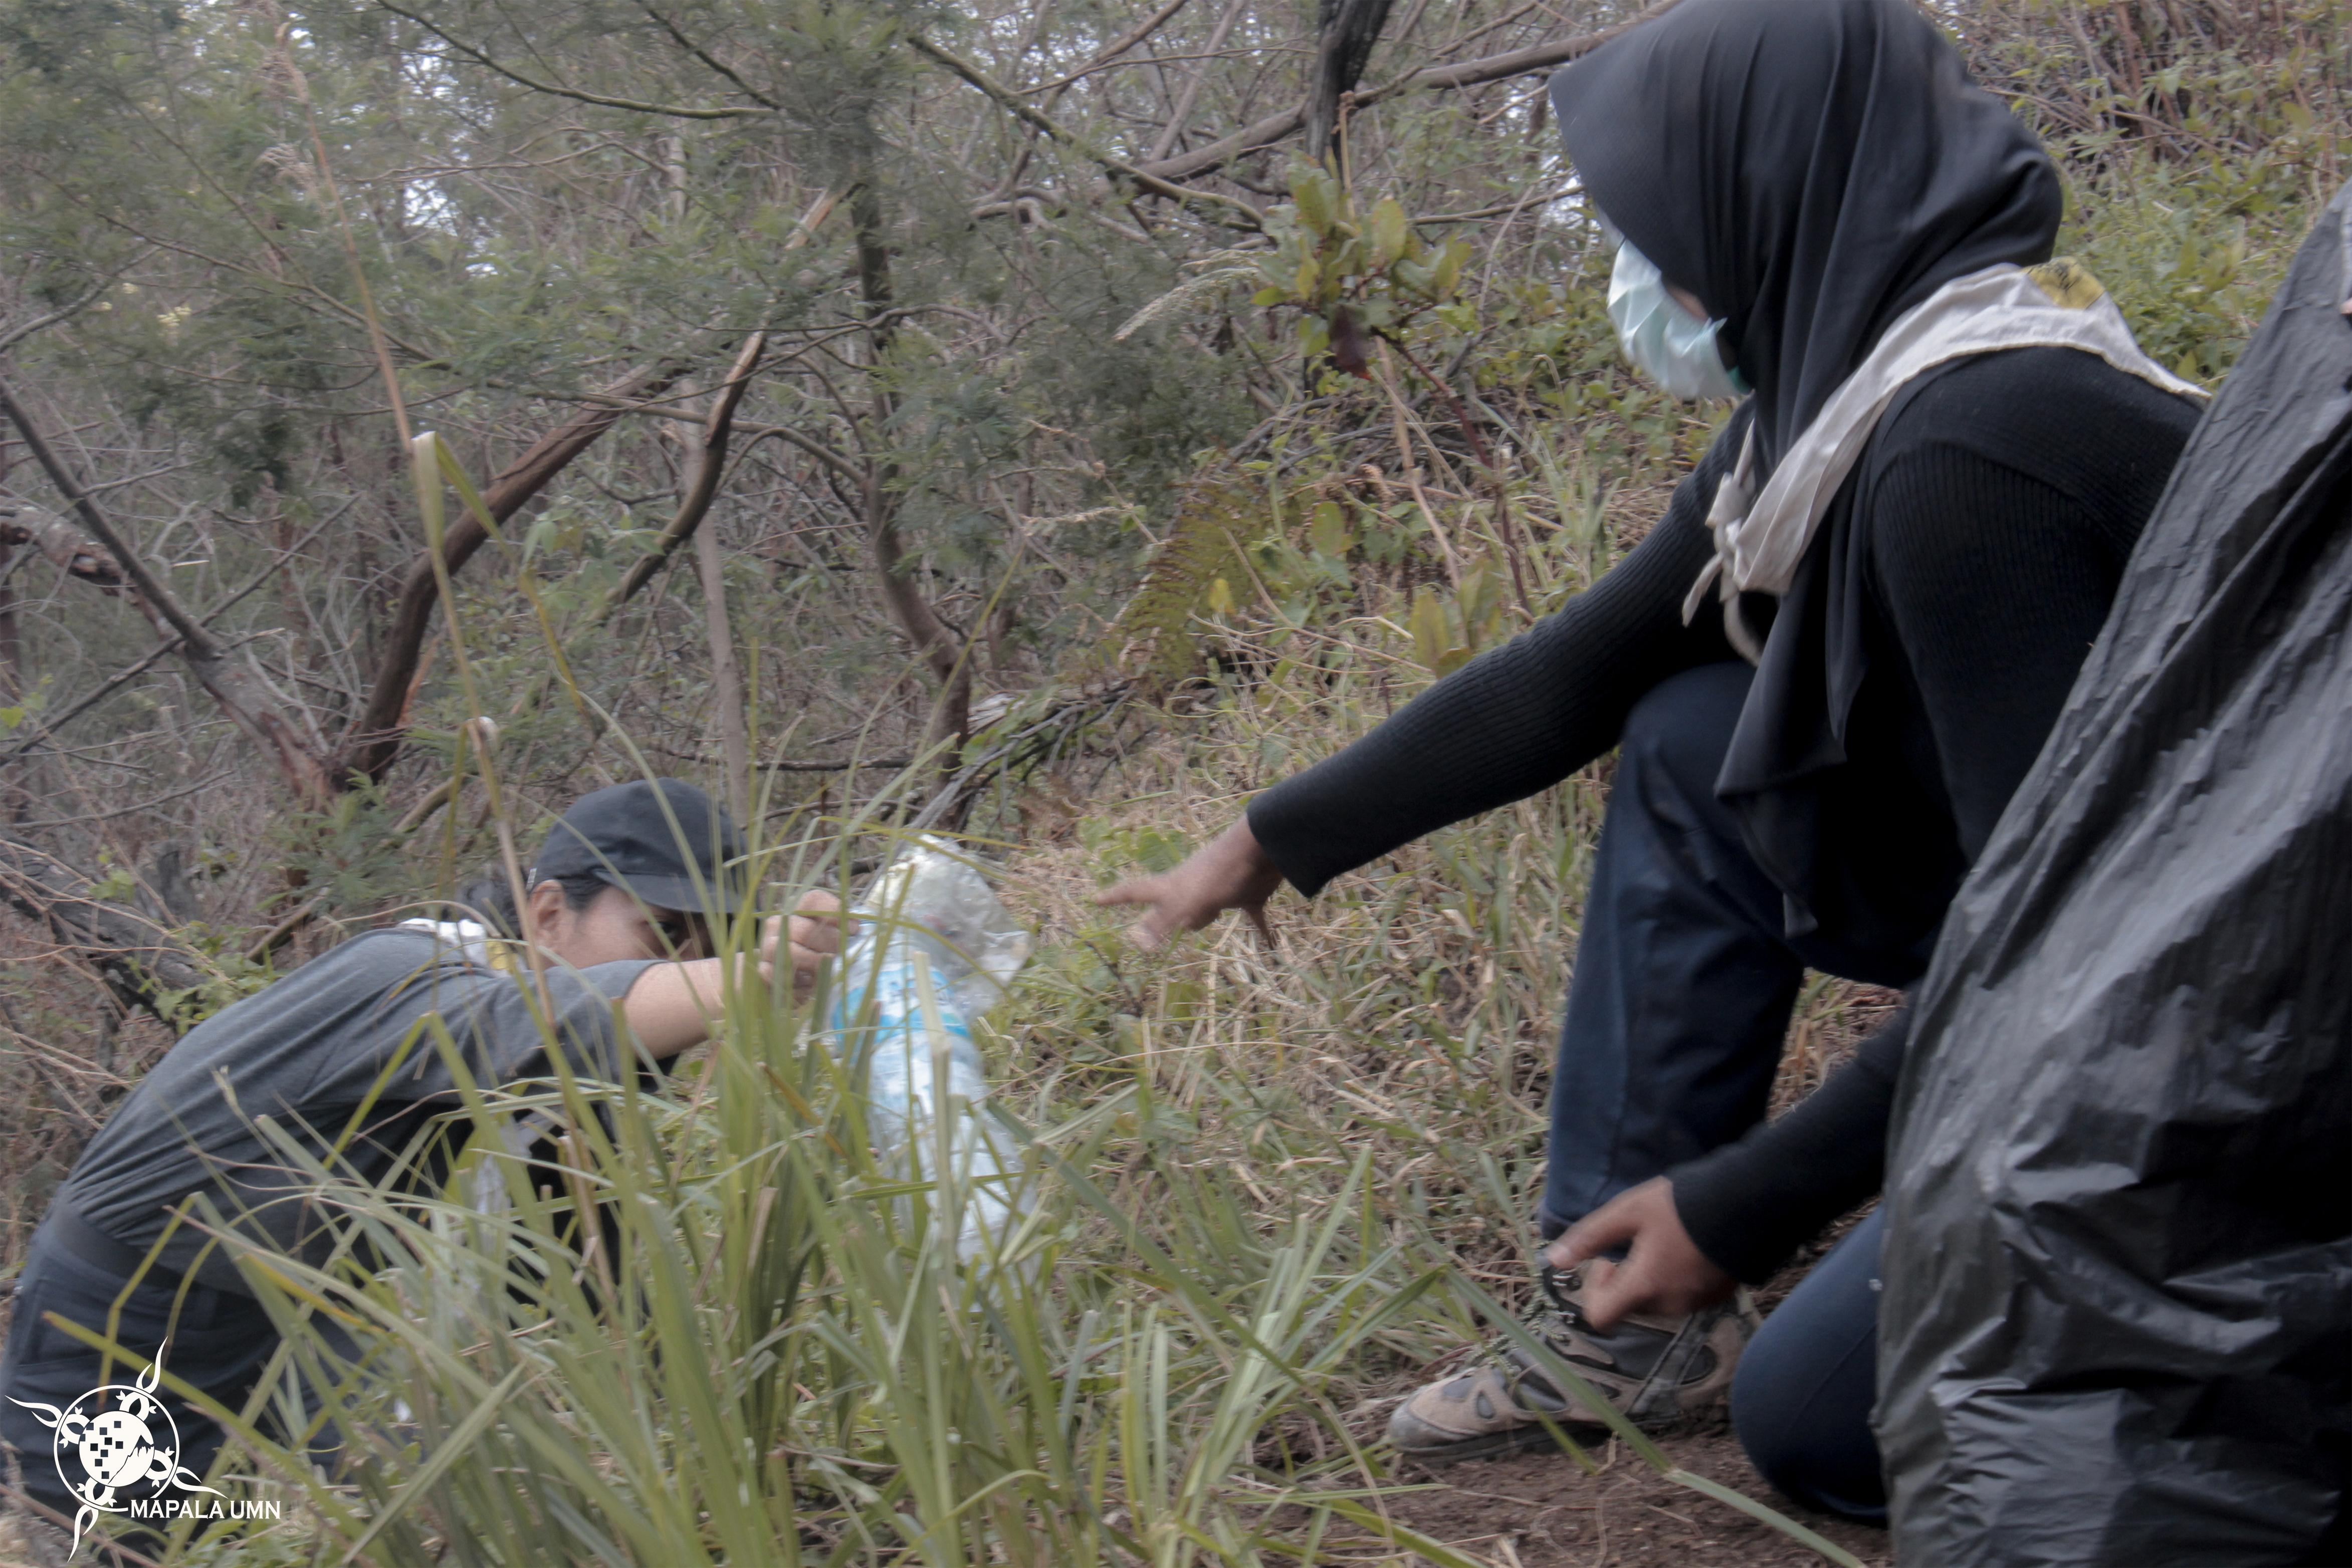 Opsi dilakukan oleh seluruh peserta maupun panitia selama pos pendakian via Cemoro Kandang | Foto: Dokumentasi Mapala UMN